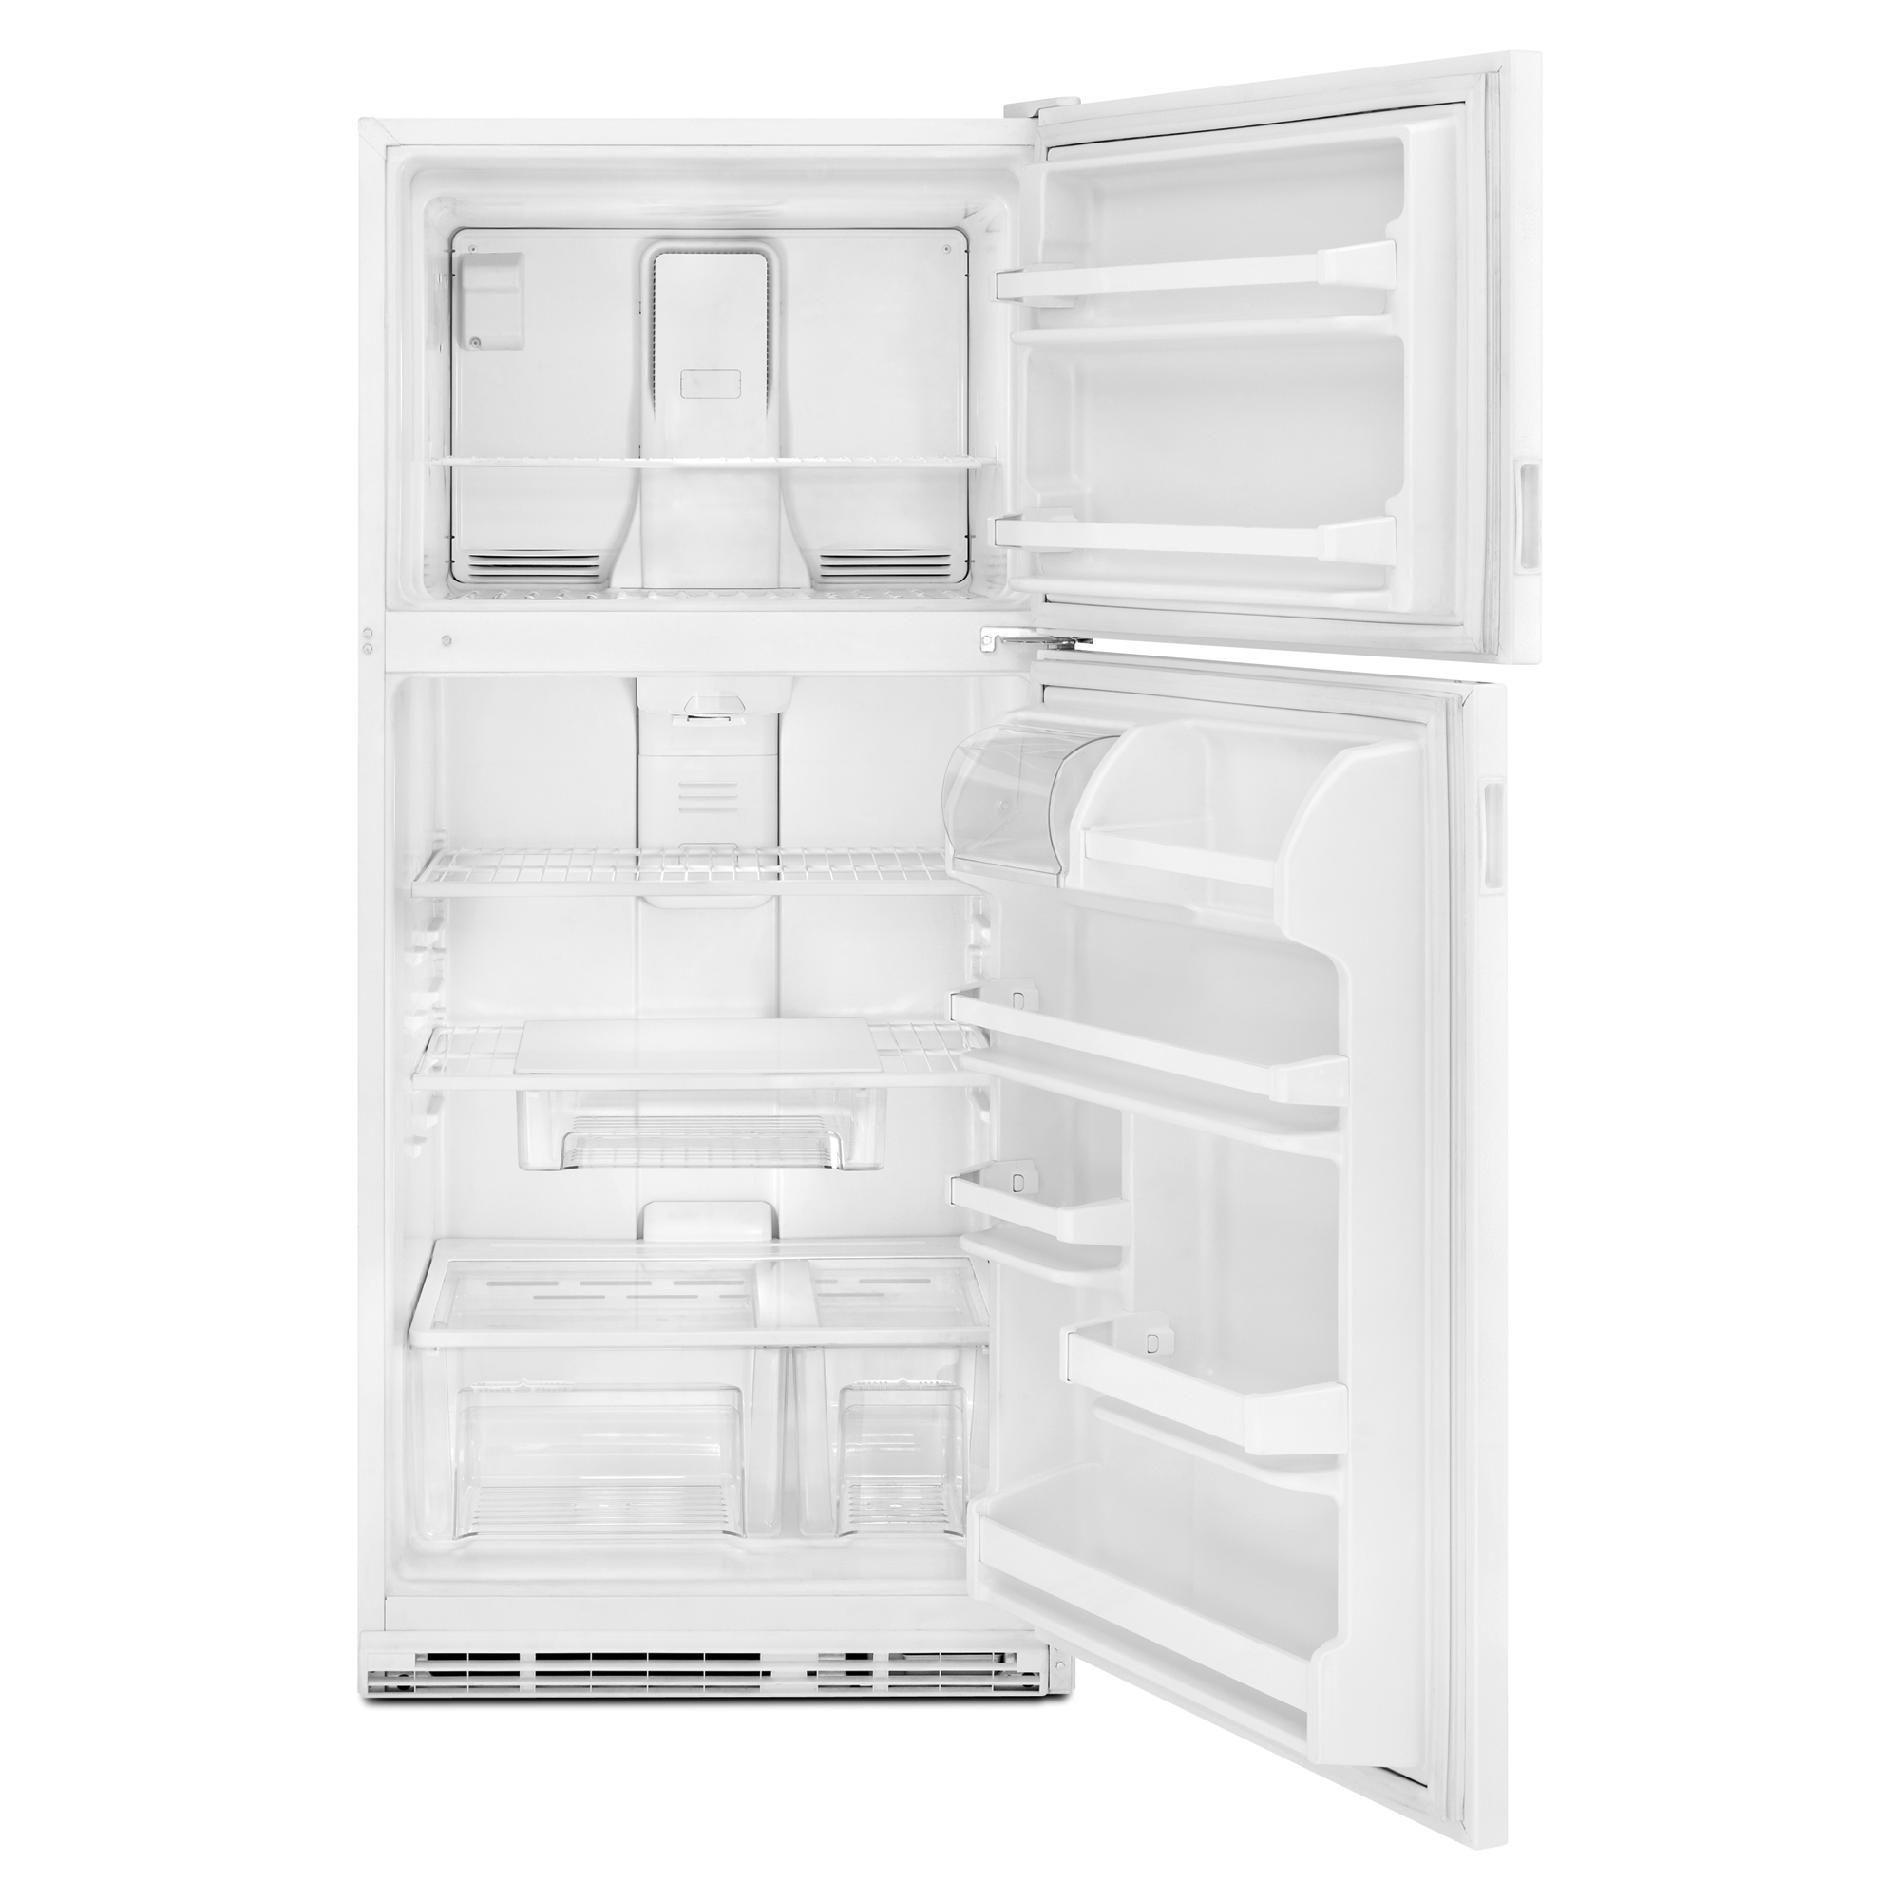 Kenmore 18.1 cu. ft. Top-Freezer Refrigerator, Right Hinge, Non-Ice